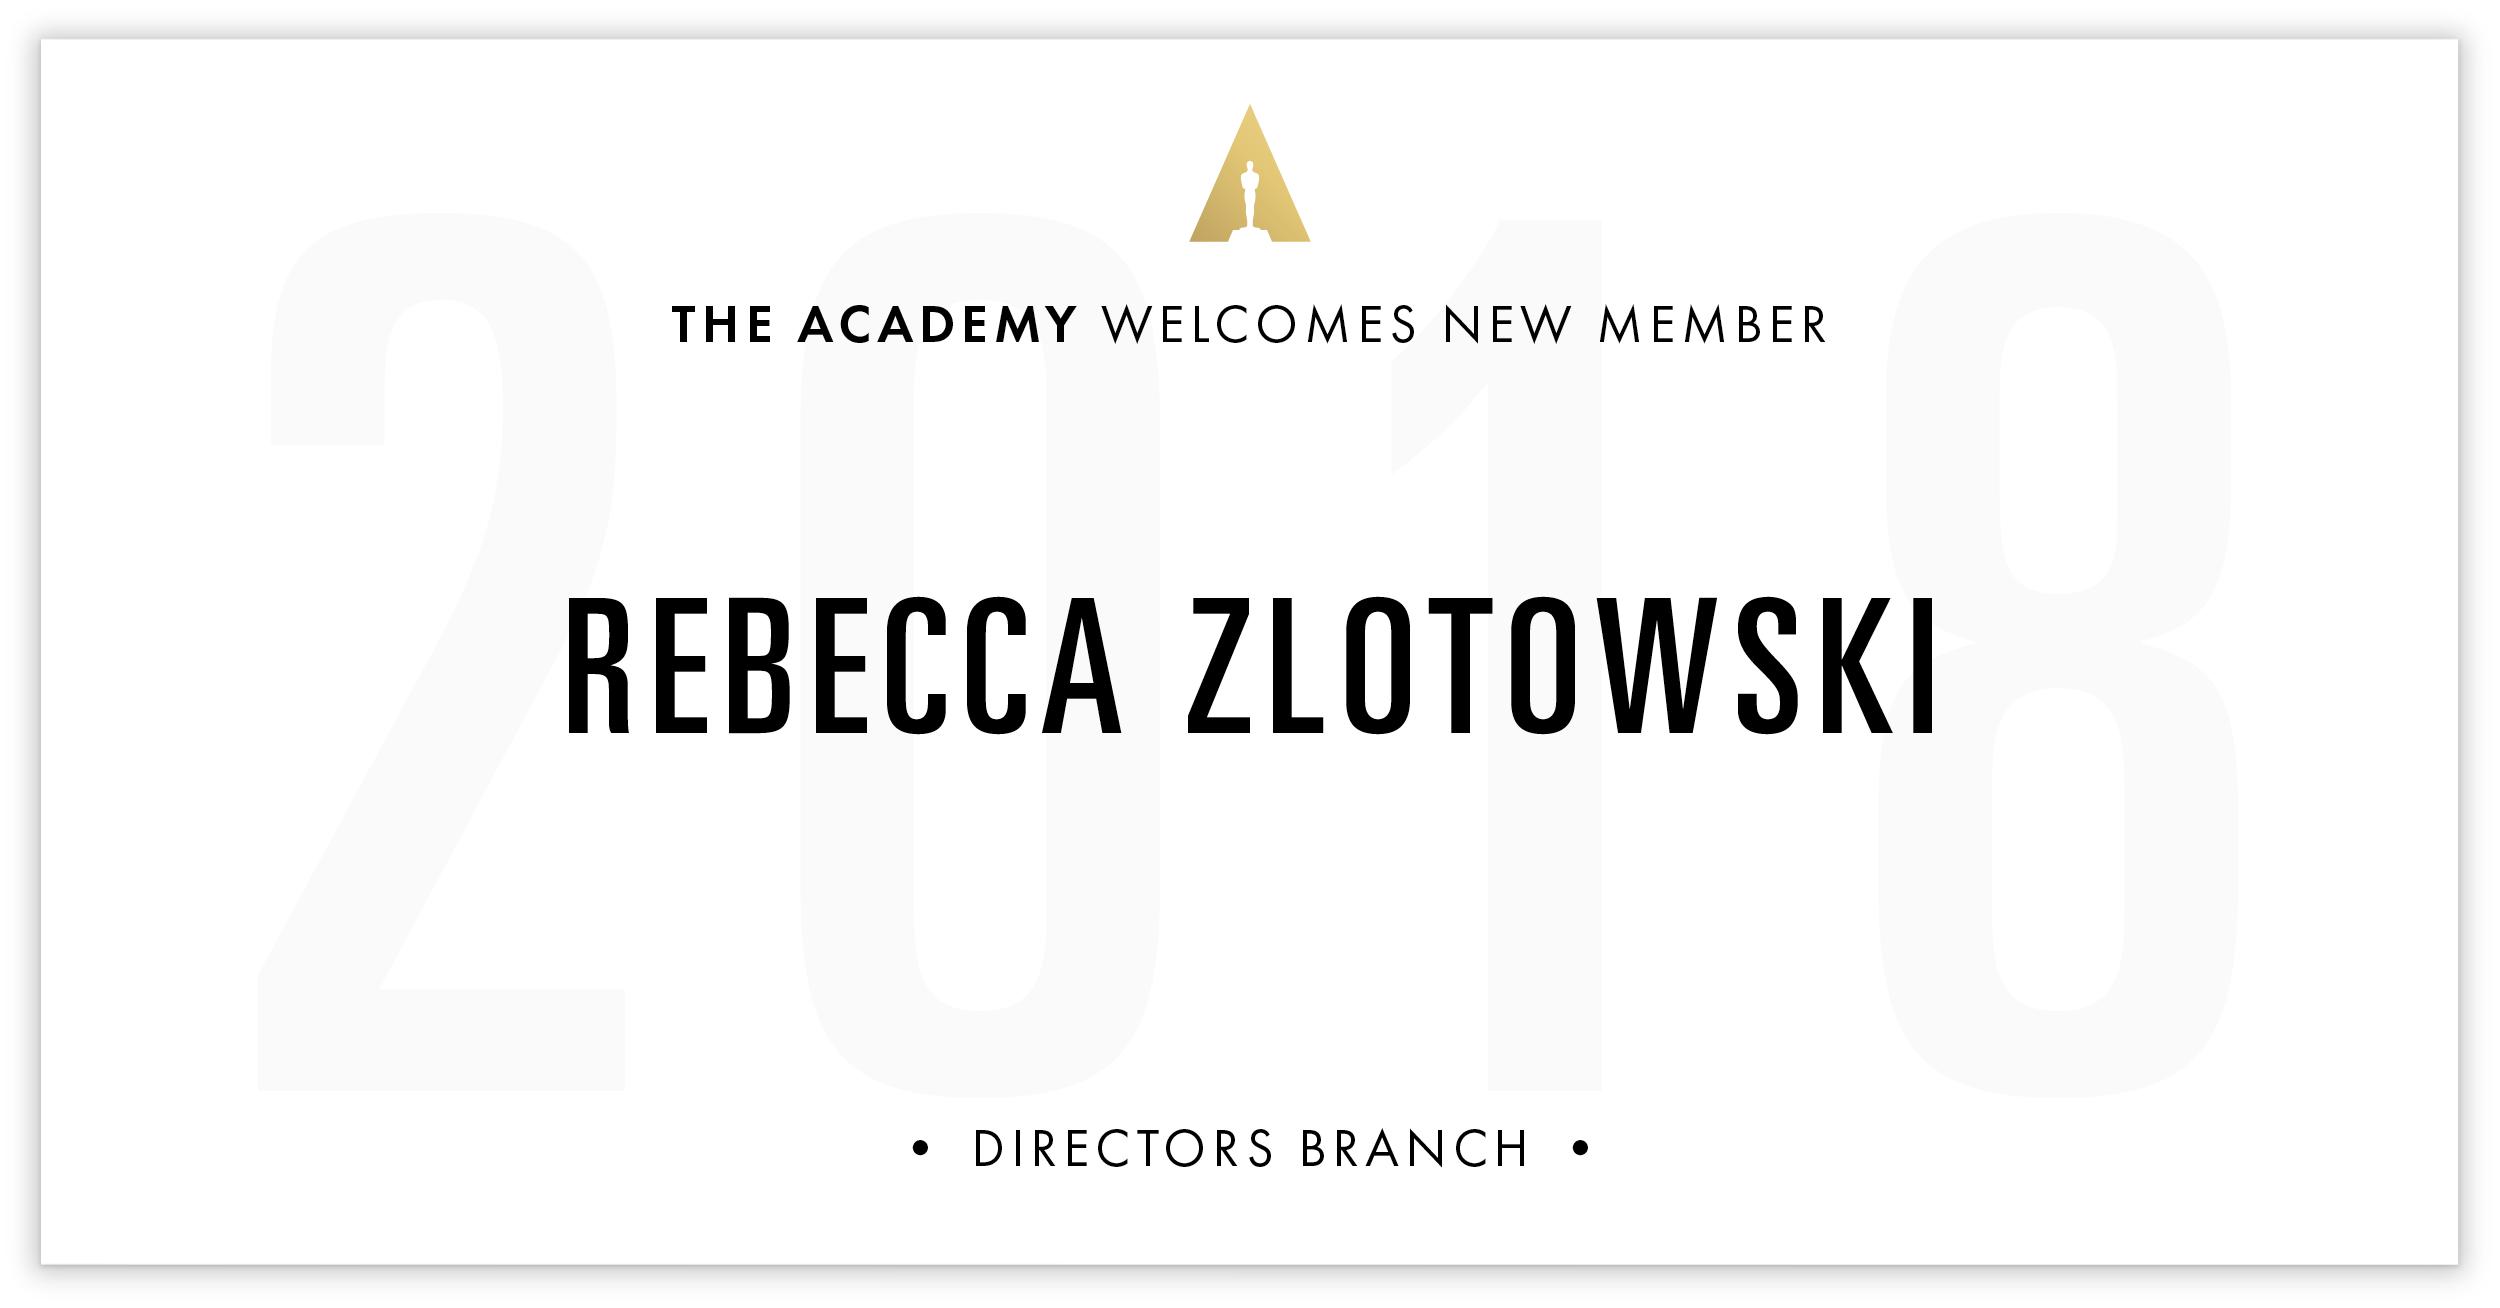 Rebecca Zlotowski is invited!